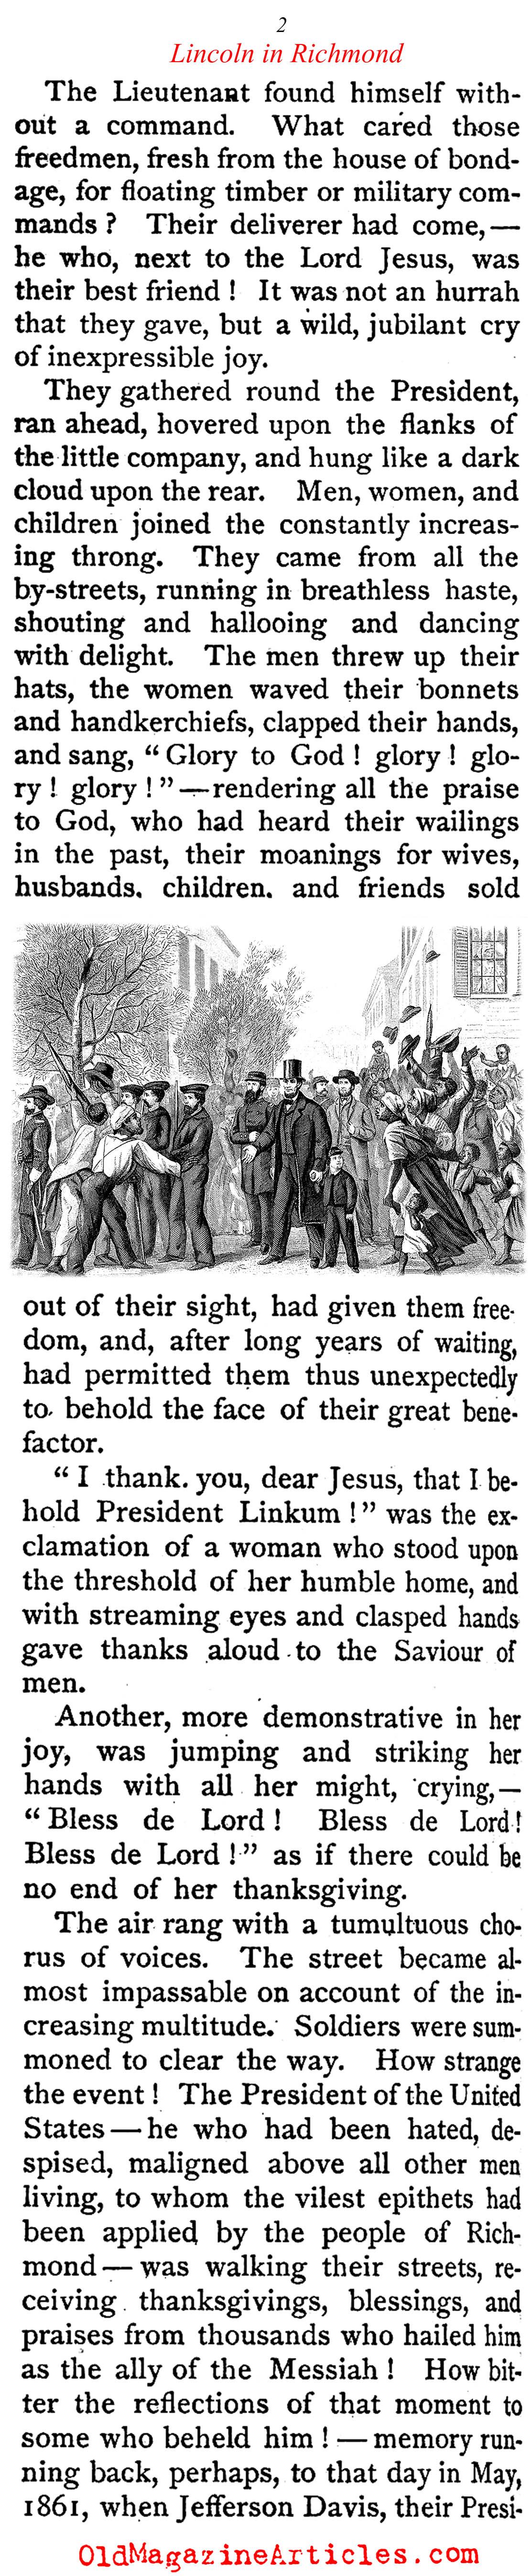 Fall of Richmond 1865 Lincoln